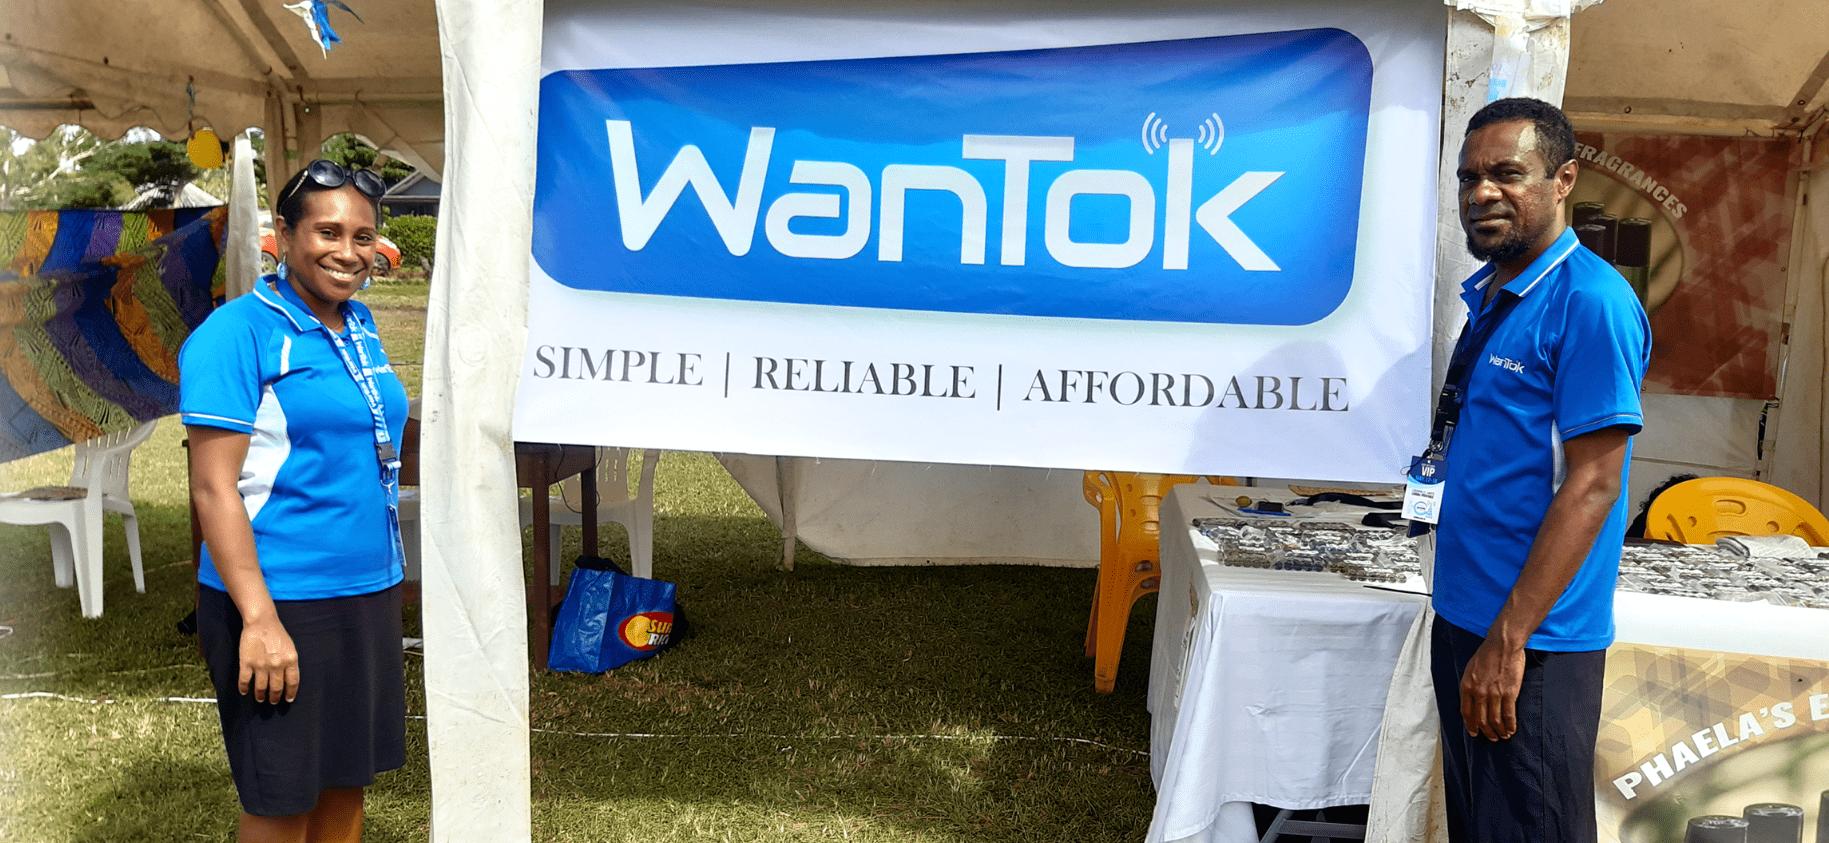 WanTok Sponsored Vanuatu's National ICT Day Event 2021